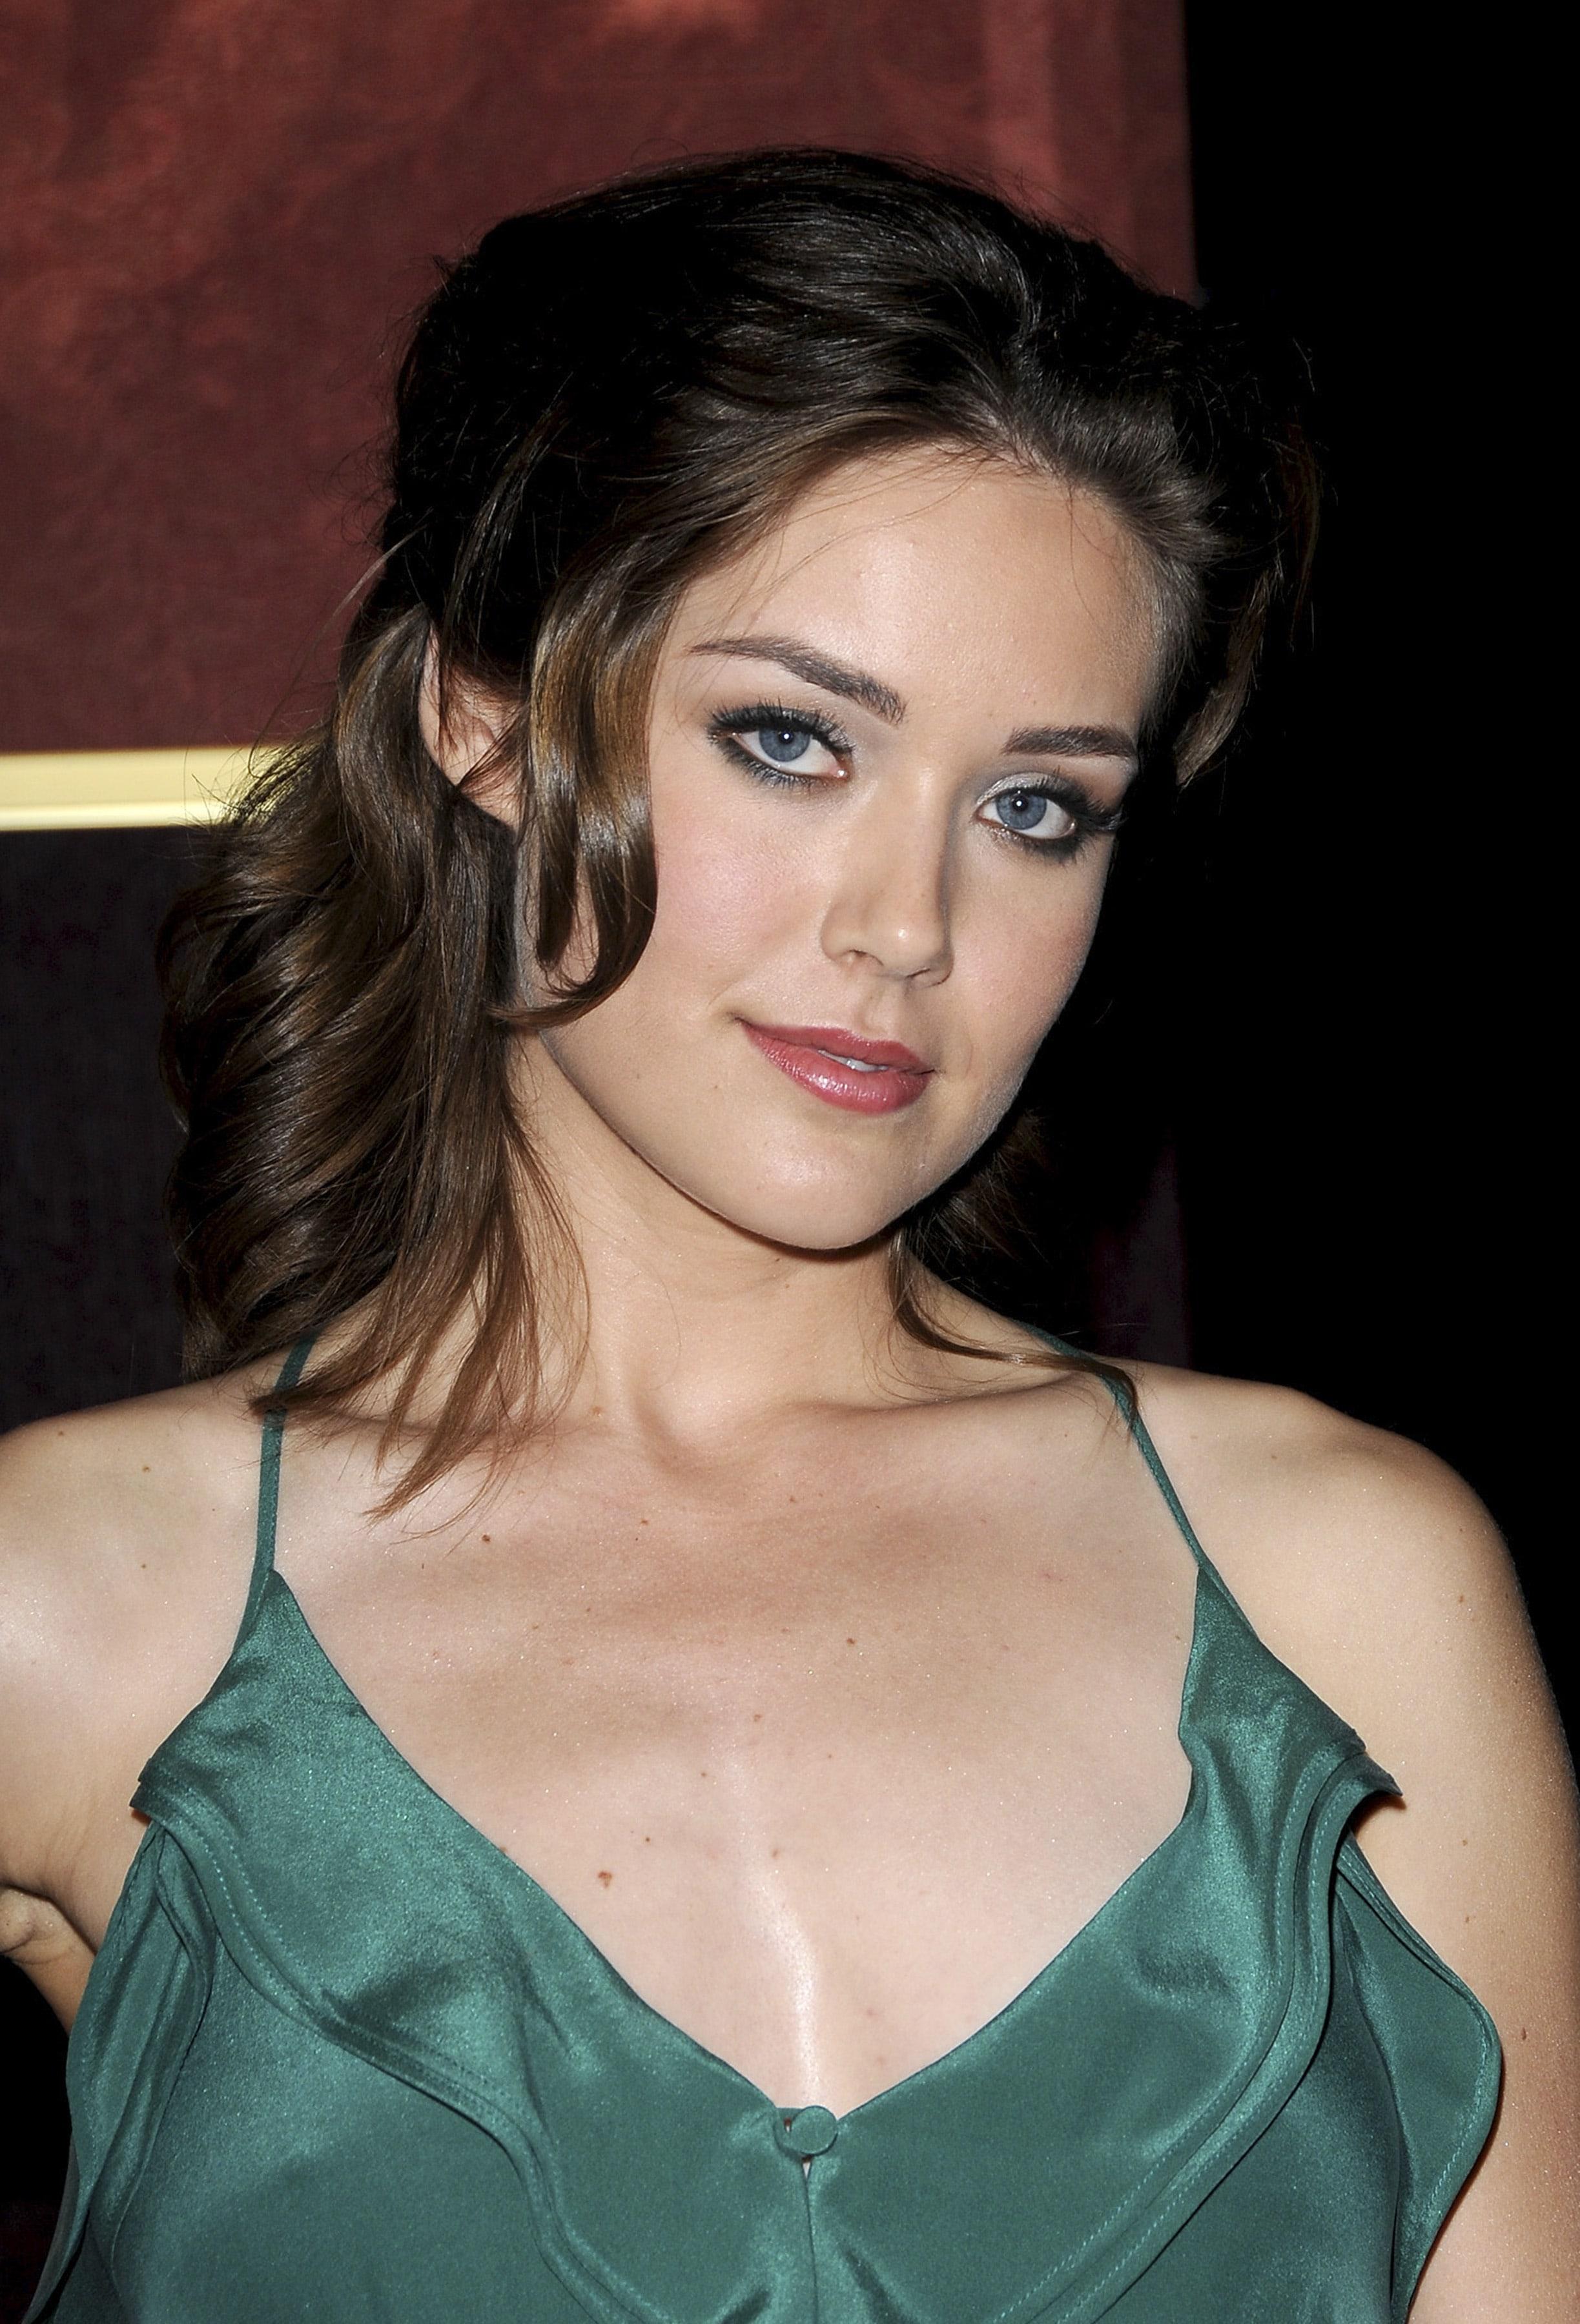 Megan Boone Free